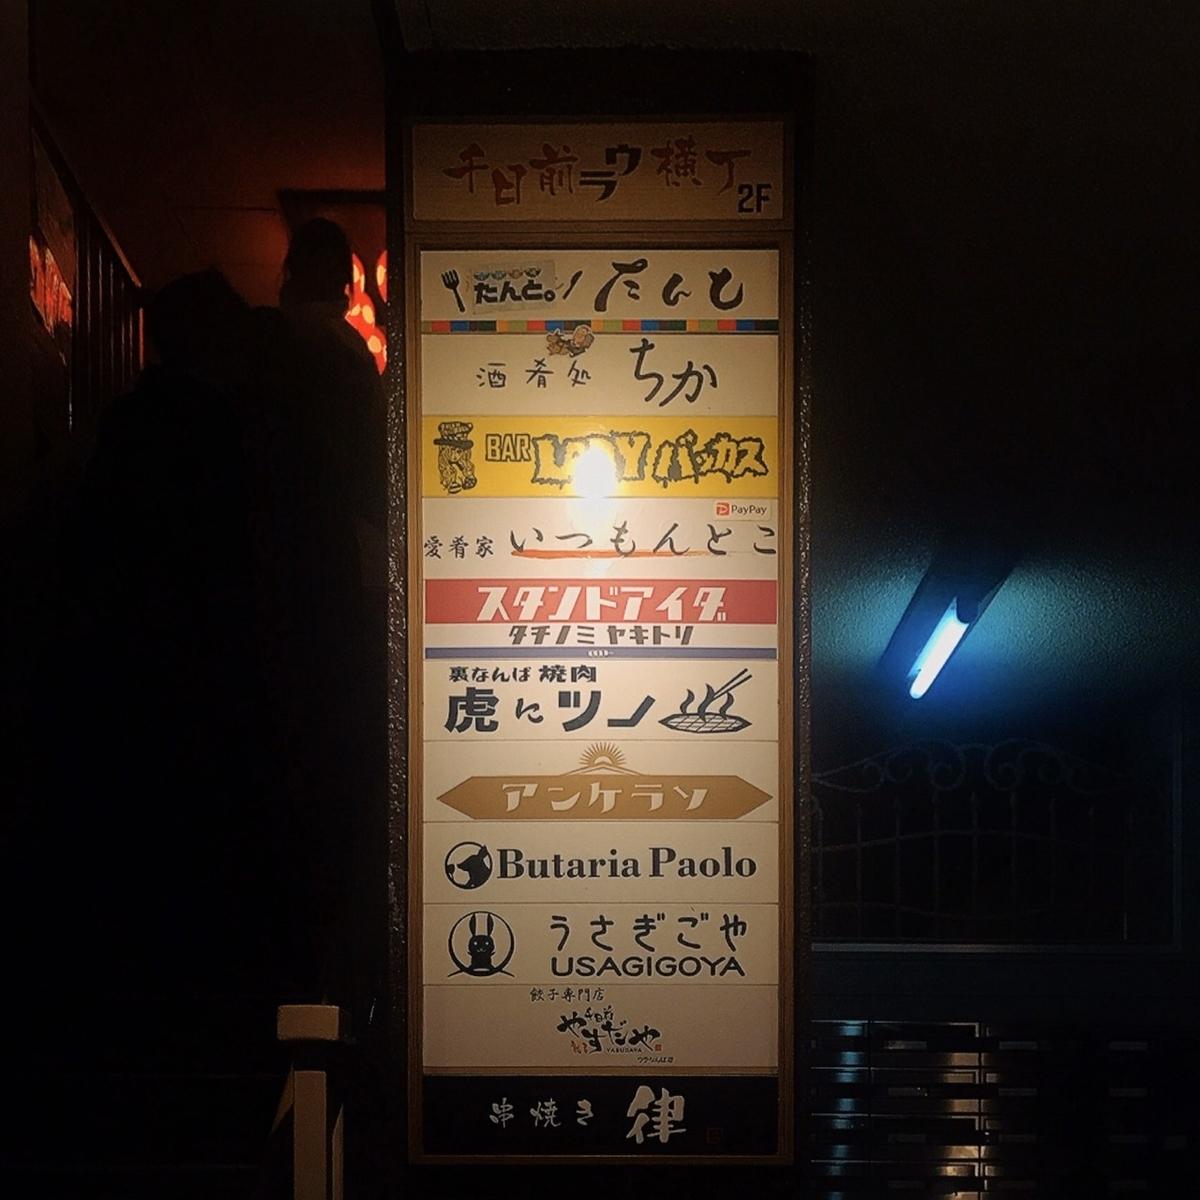 f:id:kanagurume:20200217121124j:plain